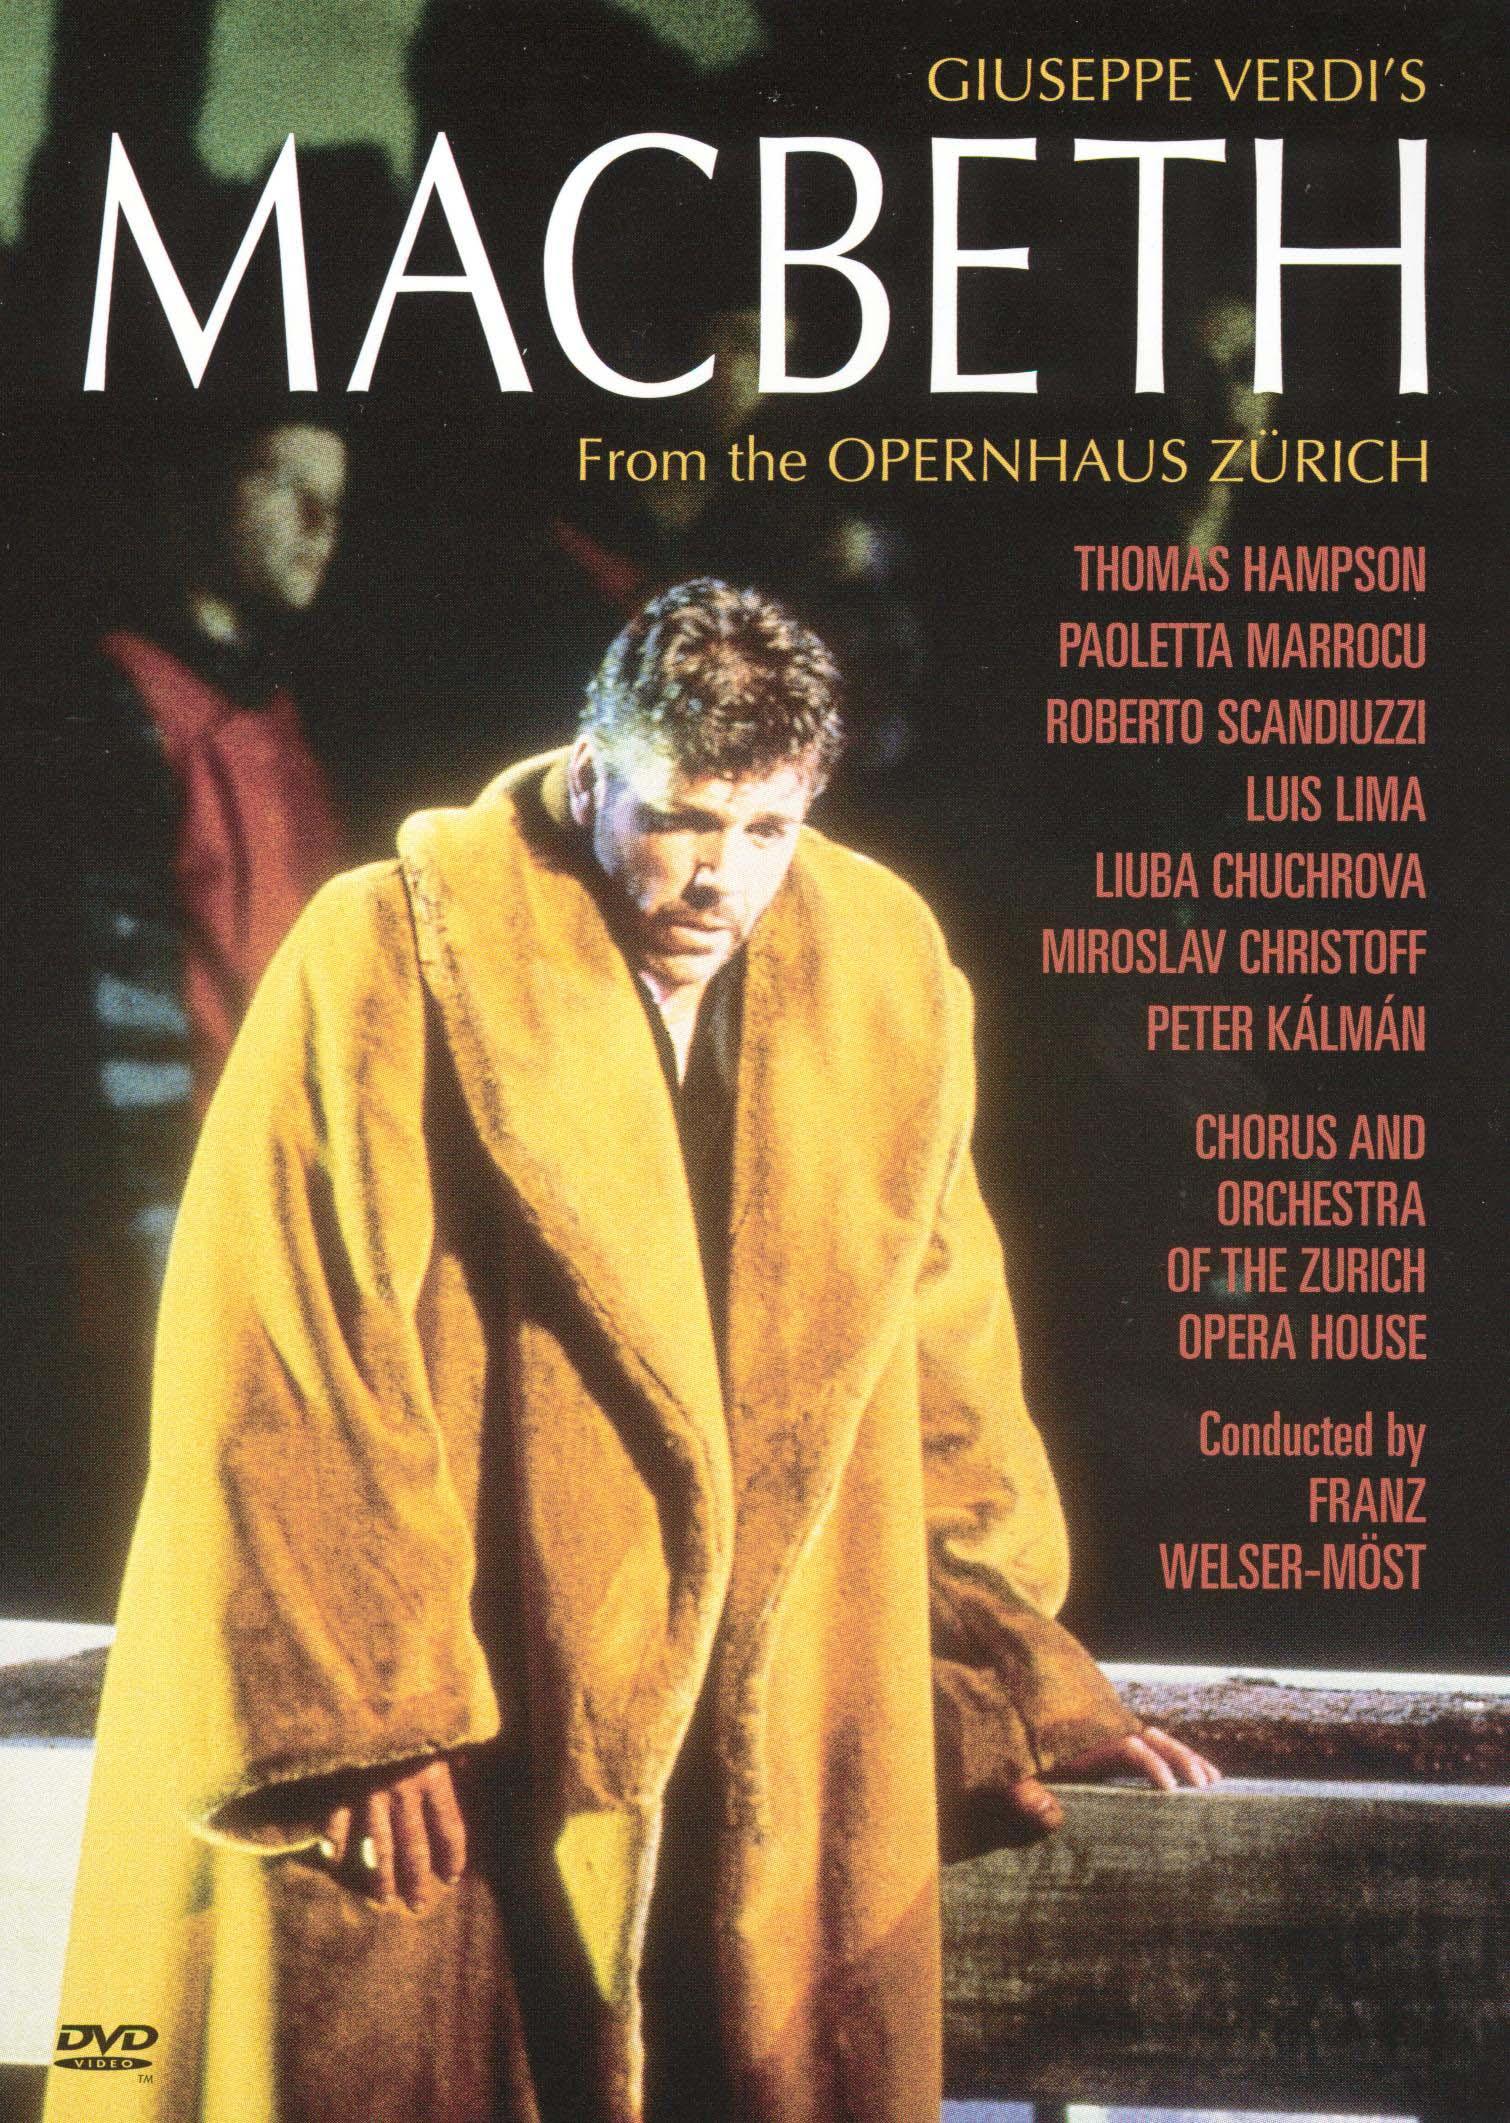 Giuseppe Verdi's Macbeth